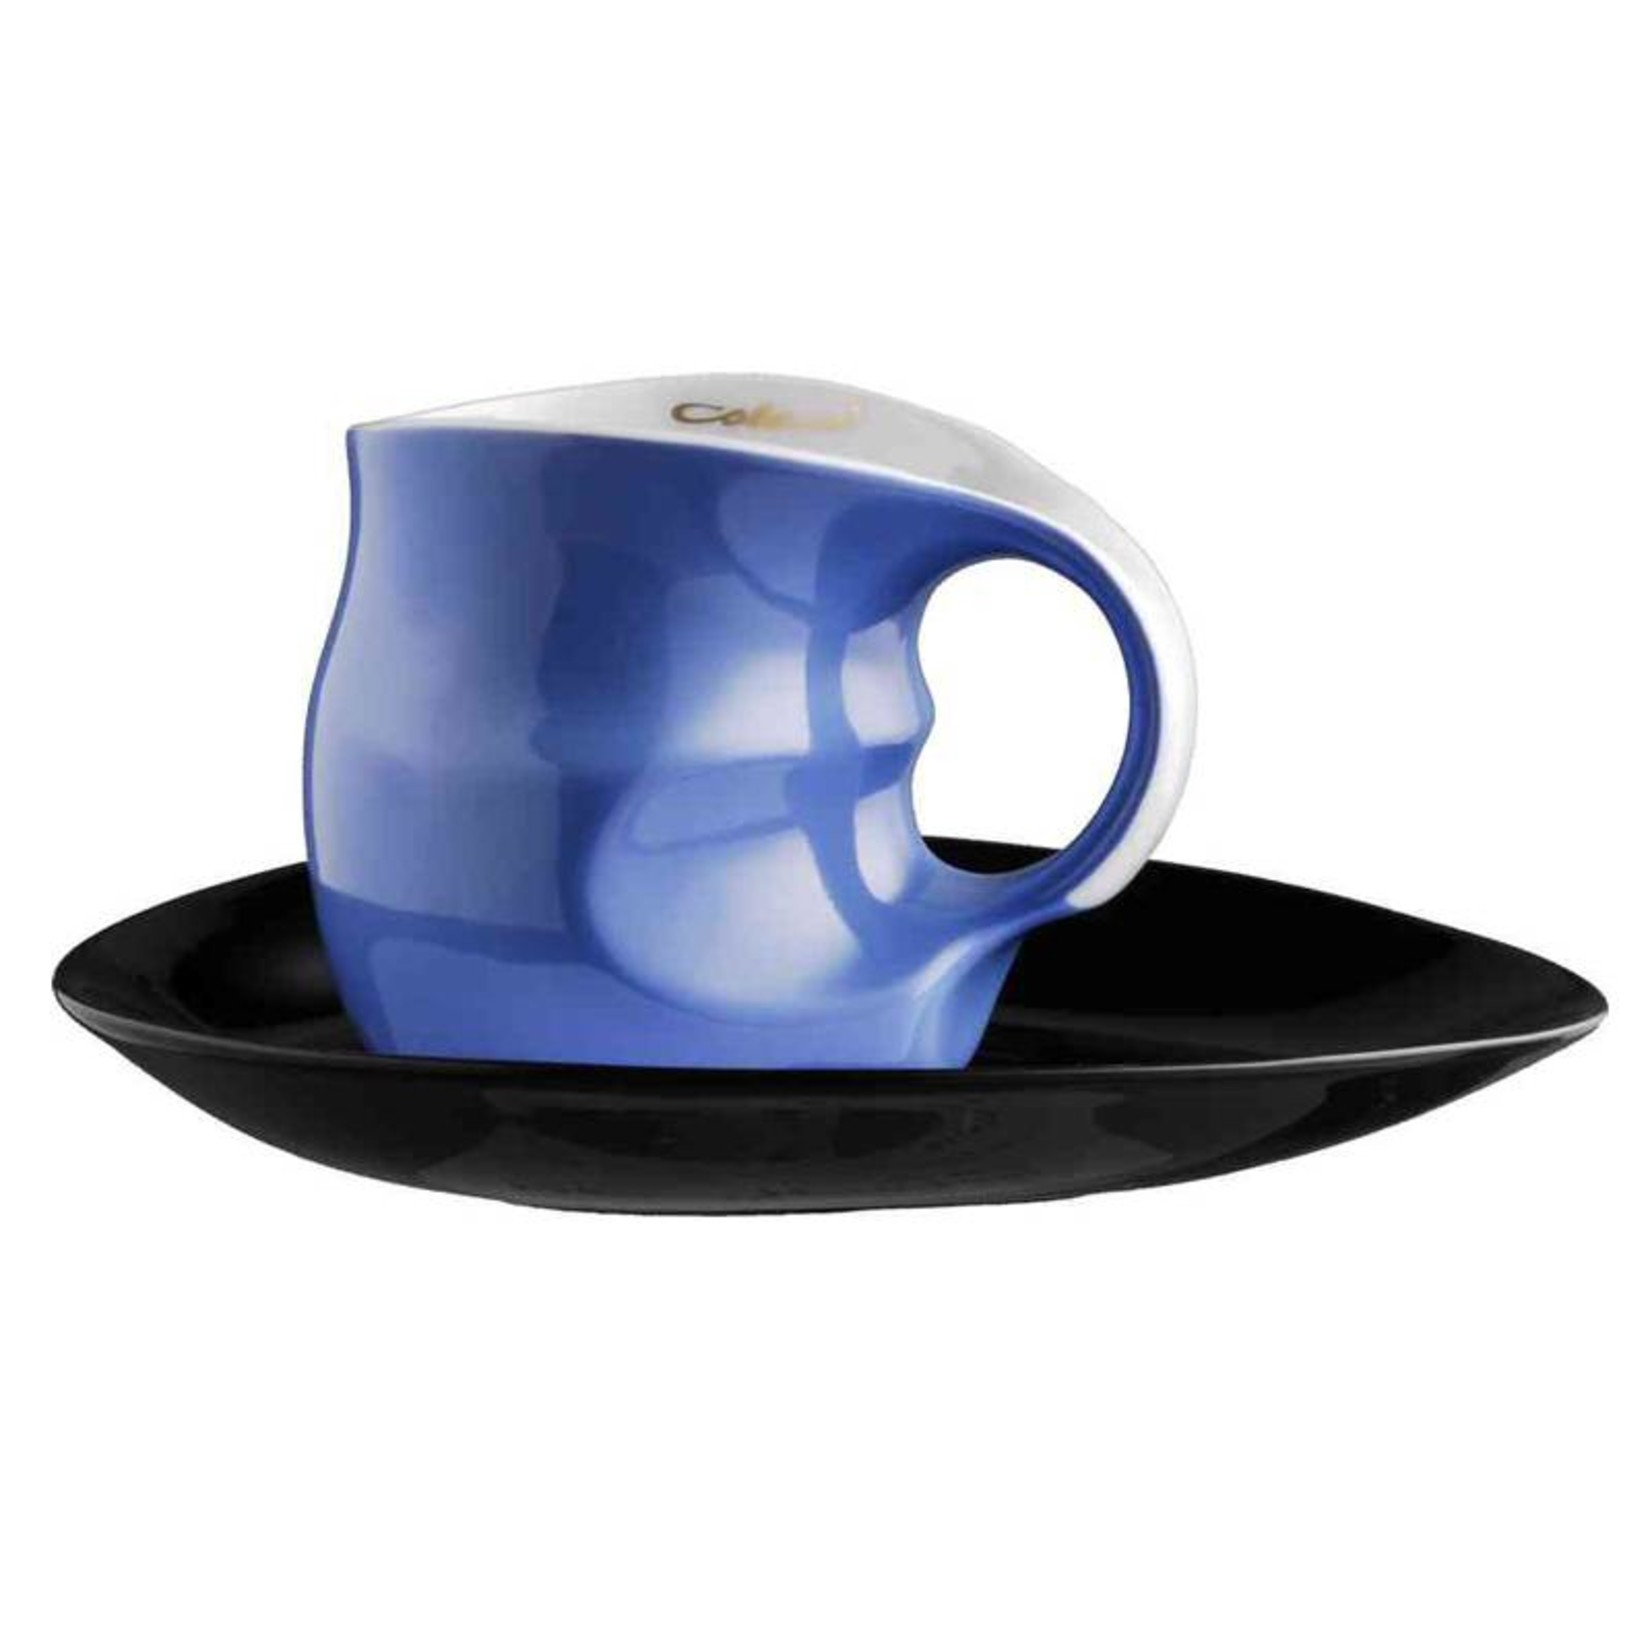 Colani Porzellanserie Colani Kaffee-/Cappuccinotasse | Tasse inkl. Unterteller | blau